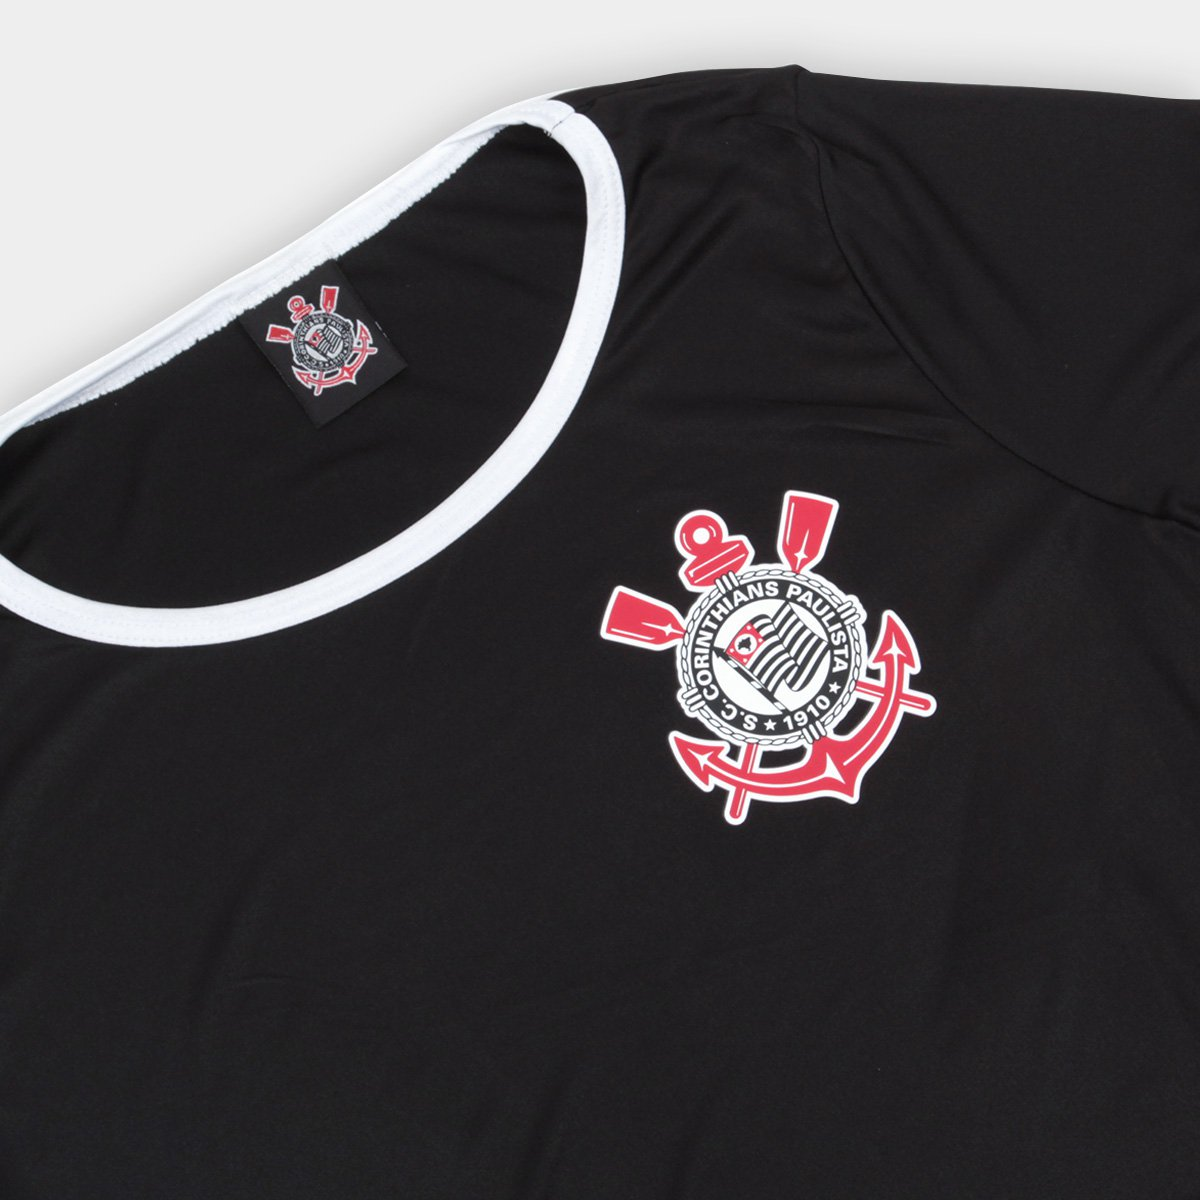 Camiseta Corinthians Basic Feminina - Compre Agora  f877ae458607b